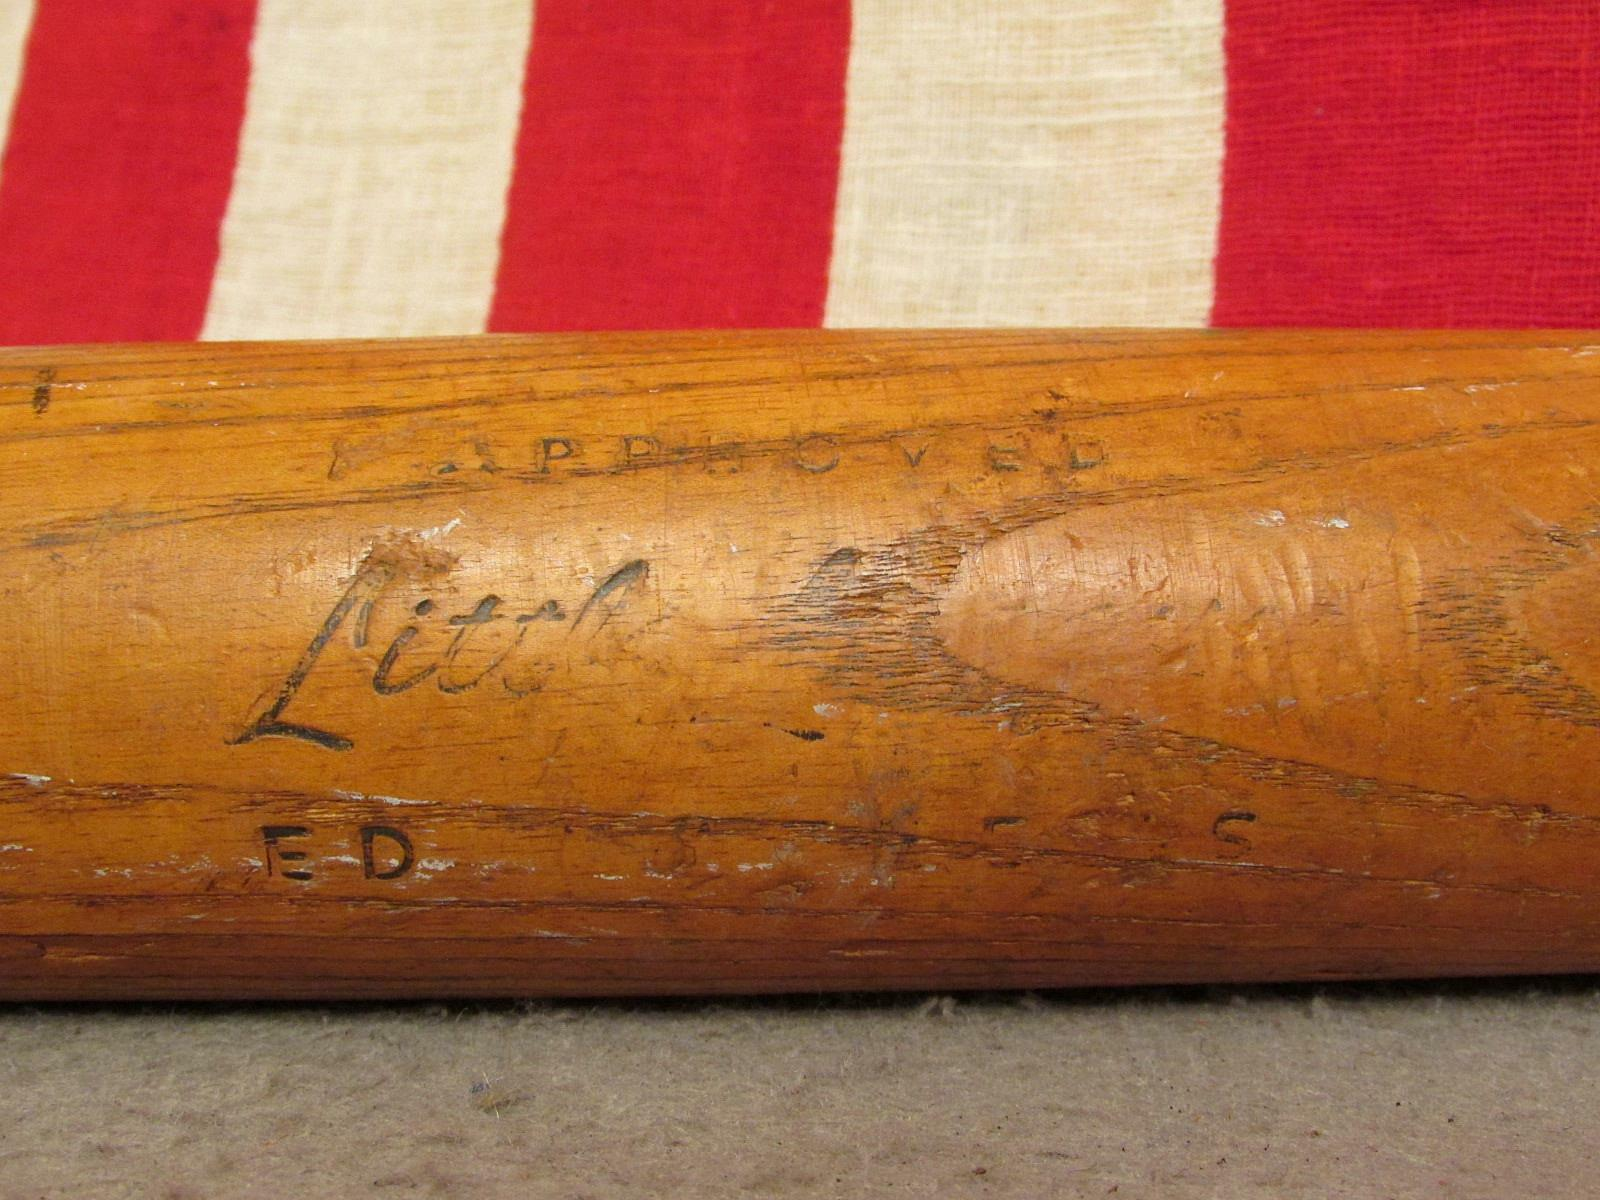 Vintage Belknap Mfg Co.Blaugrass Holz Baseballschläger Ed Mathews Ll Modell Modell Ll Hof 0b8756